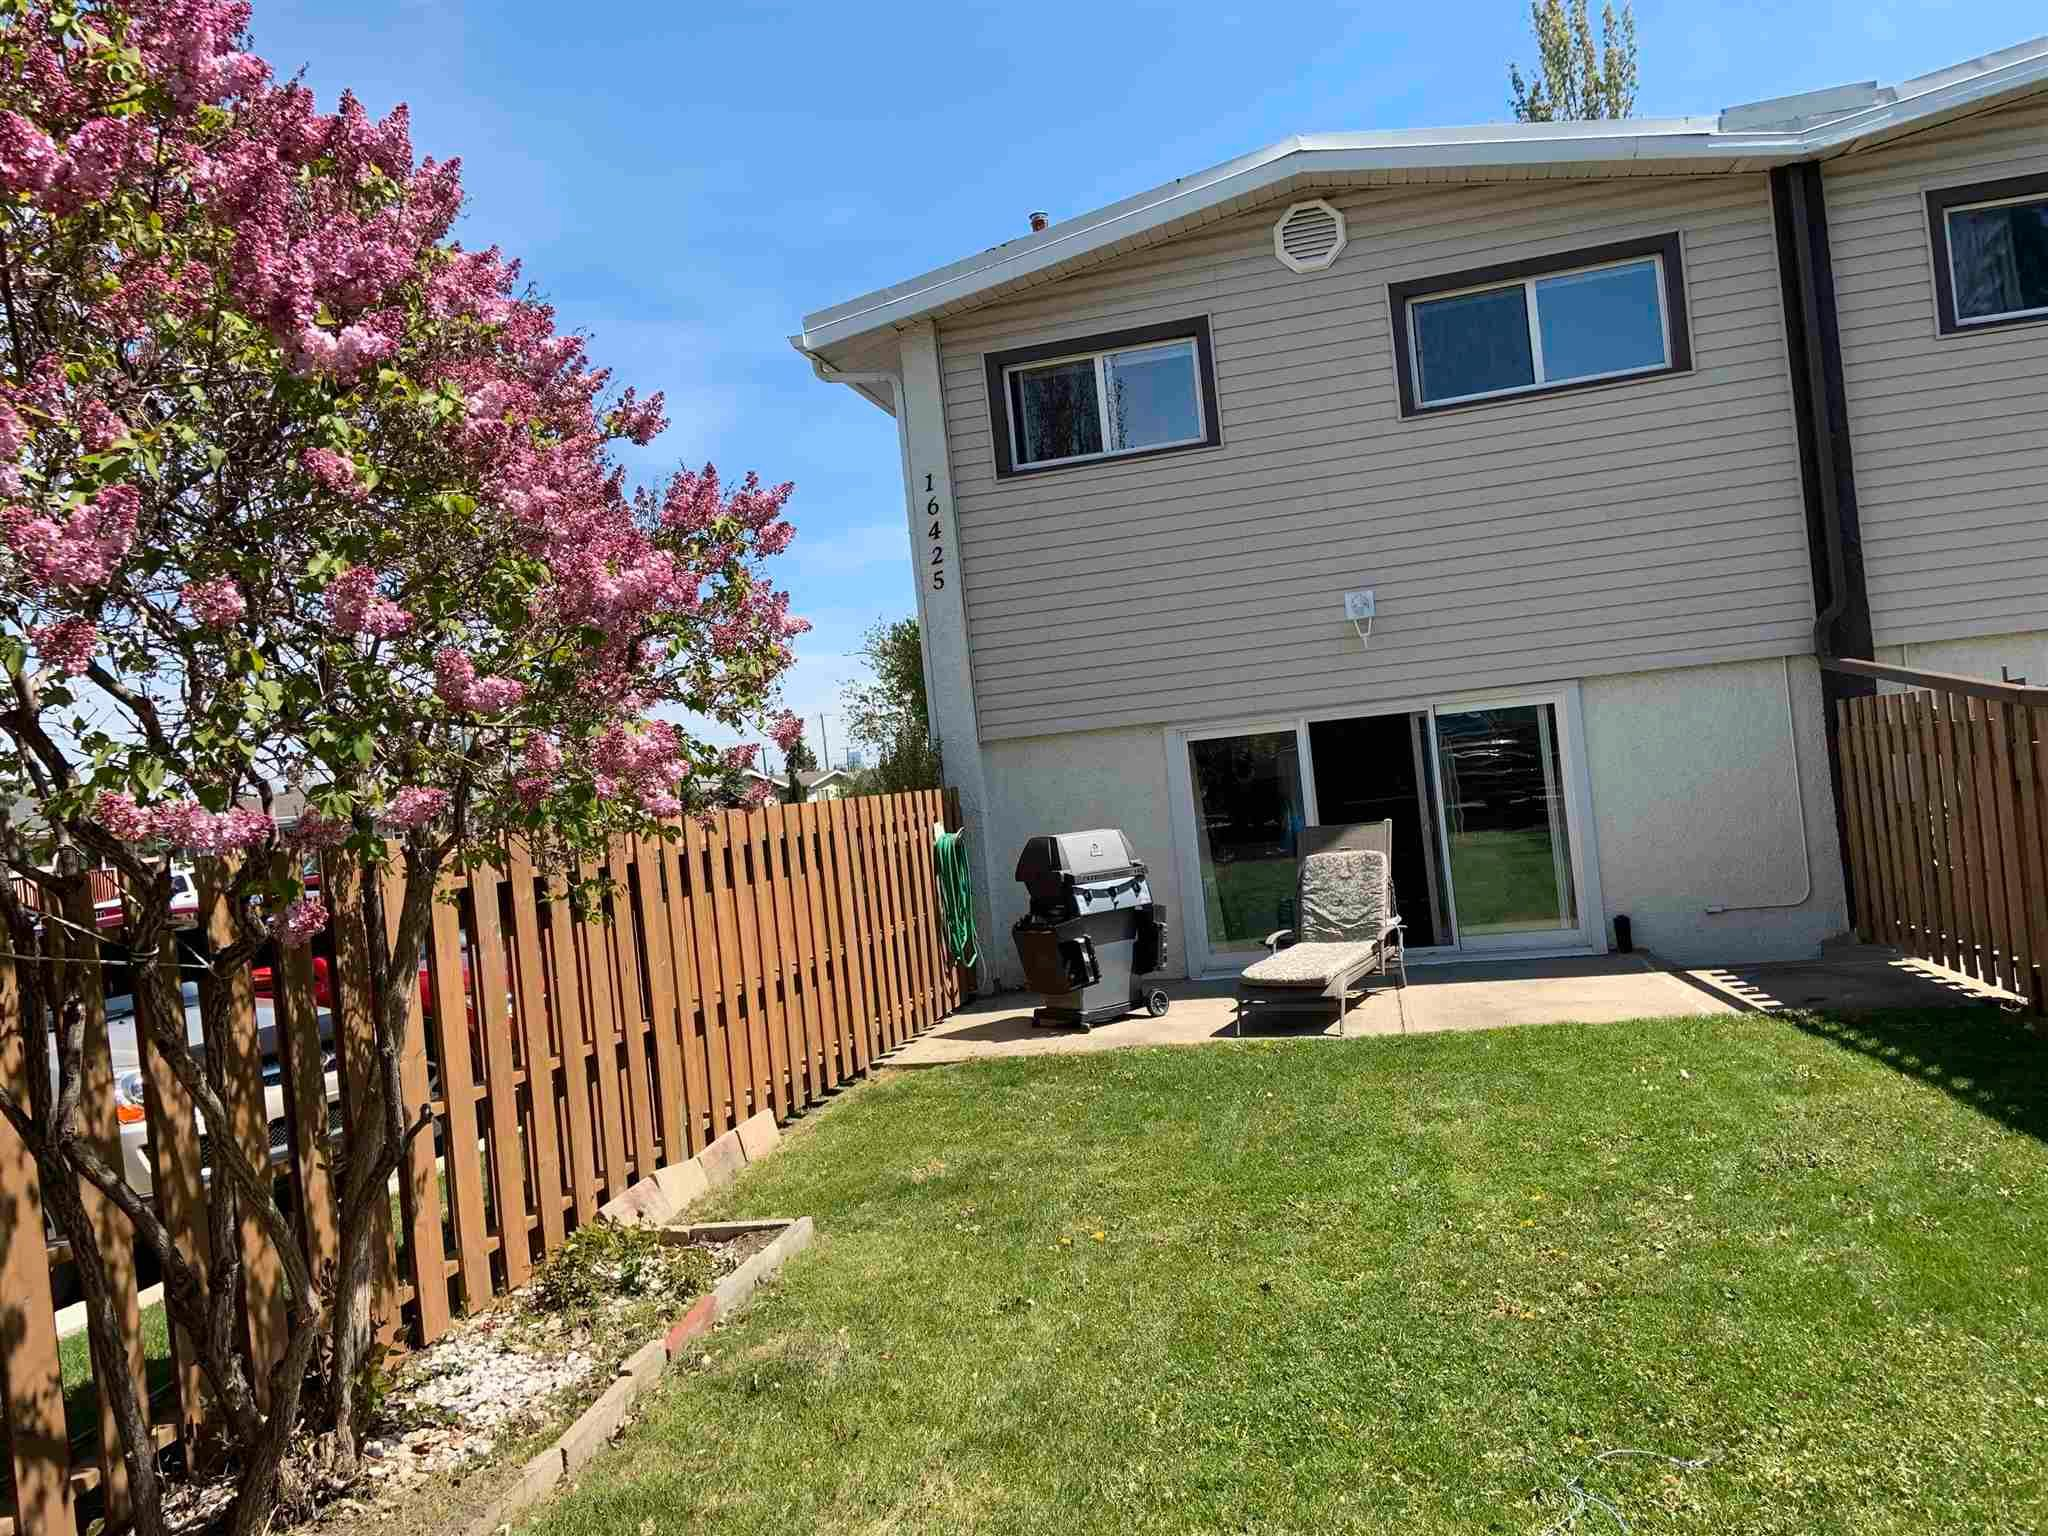 Main Photo: B 16425 89 Avenue in Edmonton: Zone 22 Townhouse for sale : MLS®# E4245801